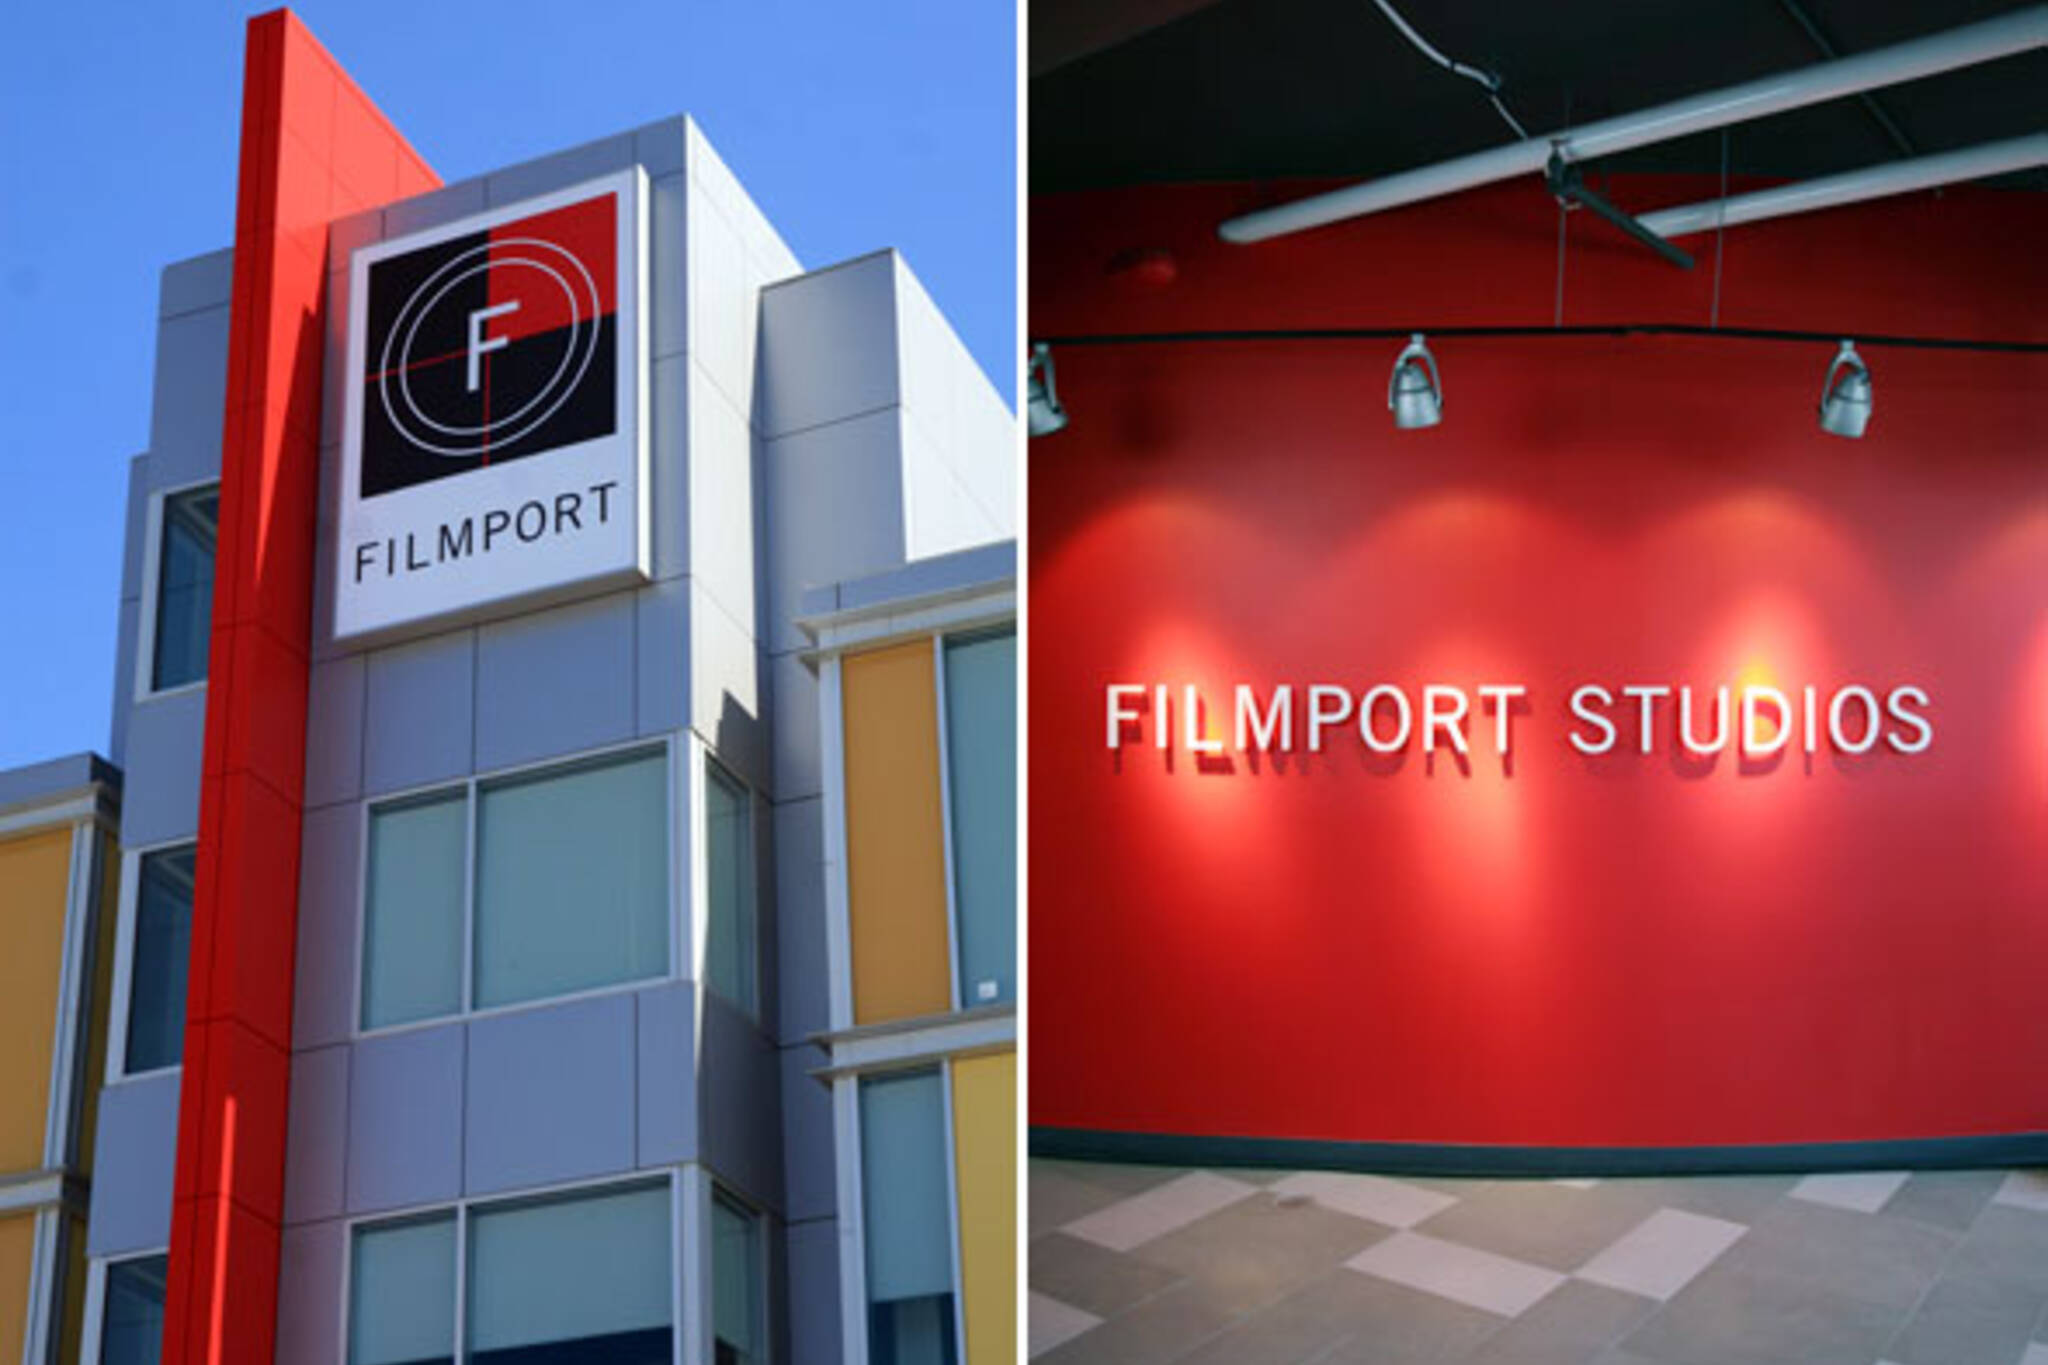 Filmport Studios